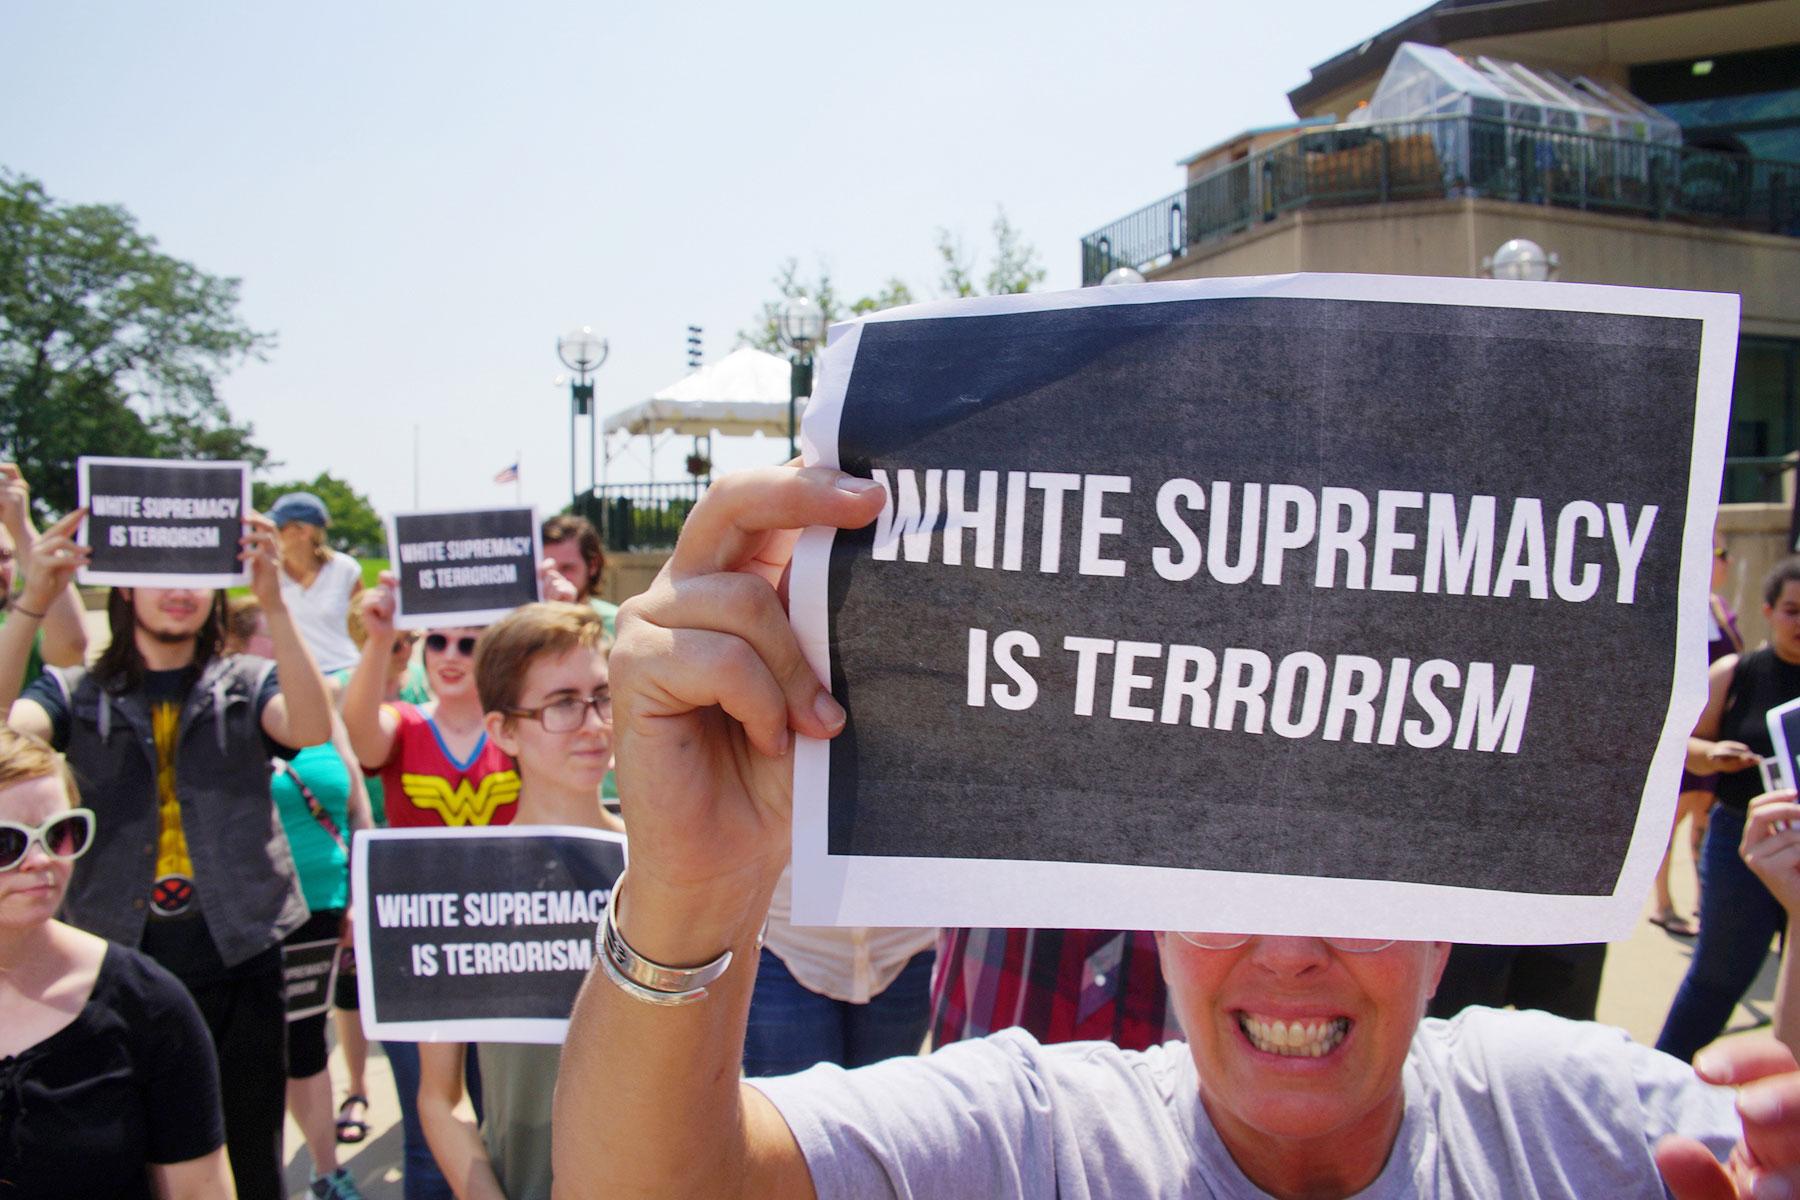 081917_whitepowerprotest_0190